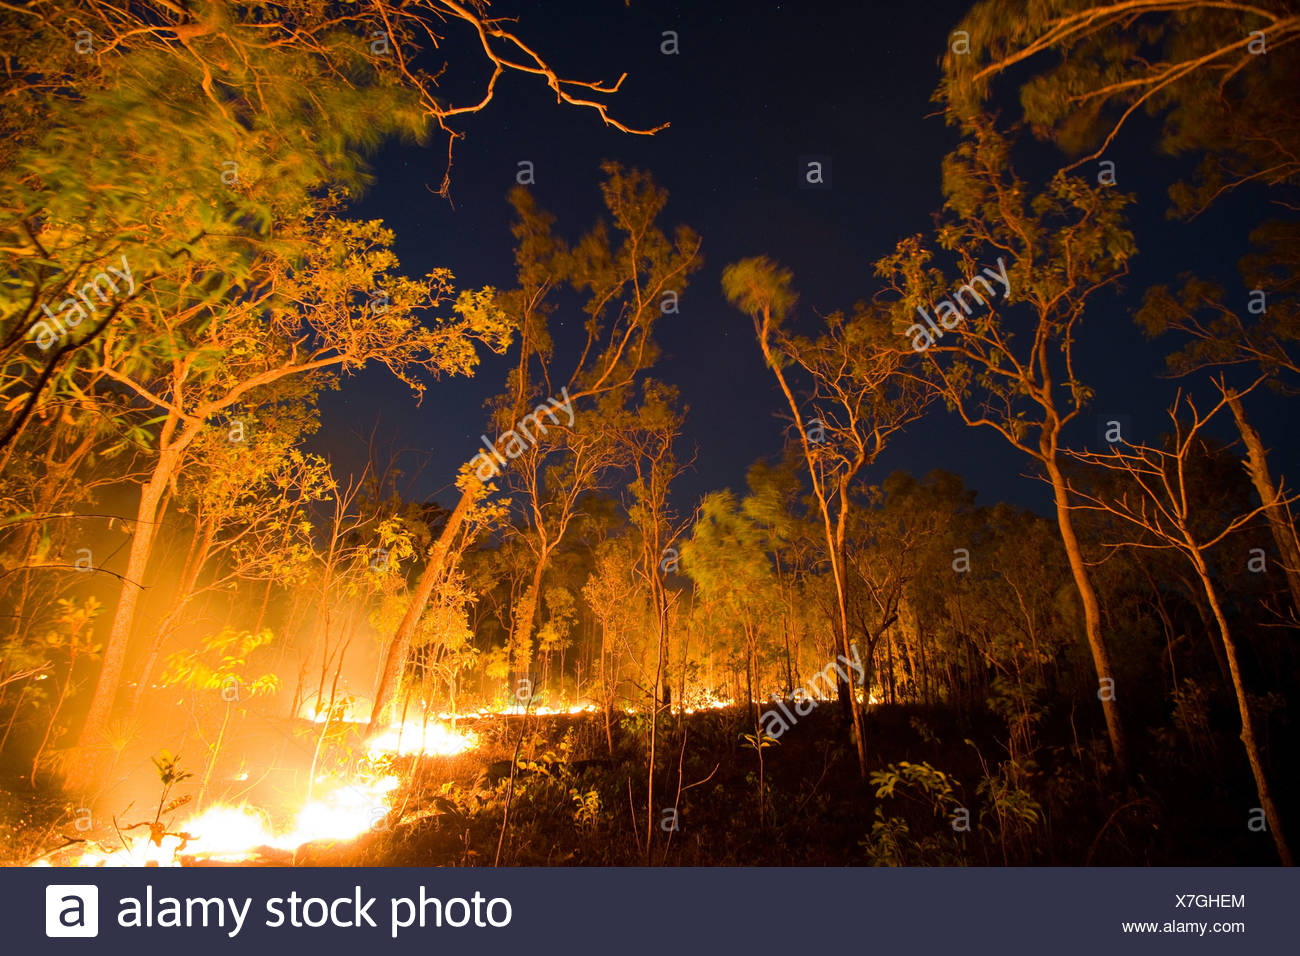 Bush fire, Arnhemland, Northern Territory - Stock Image